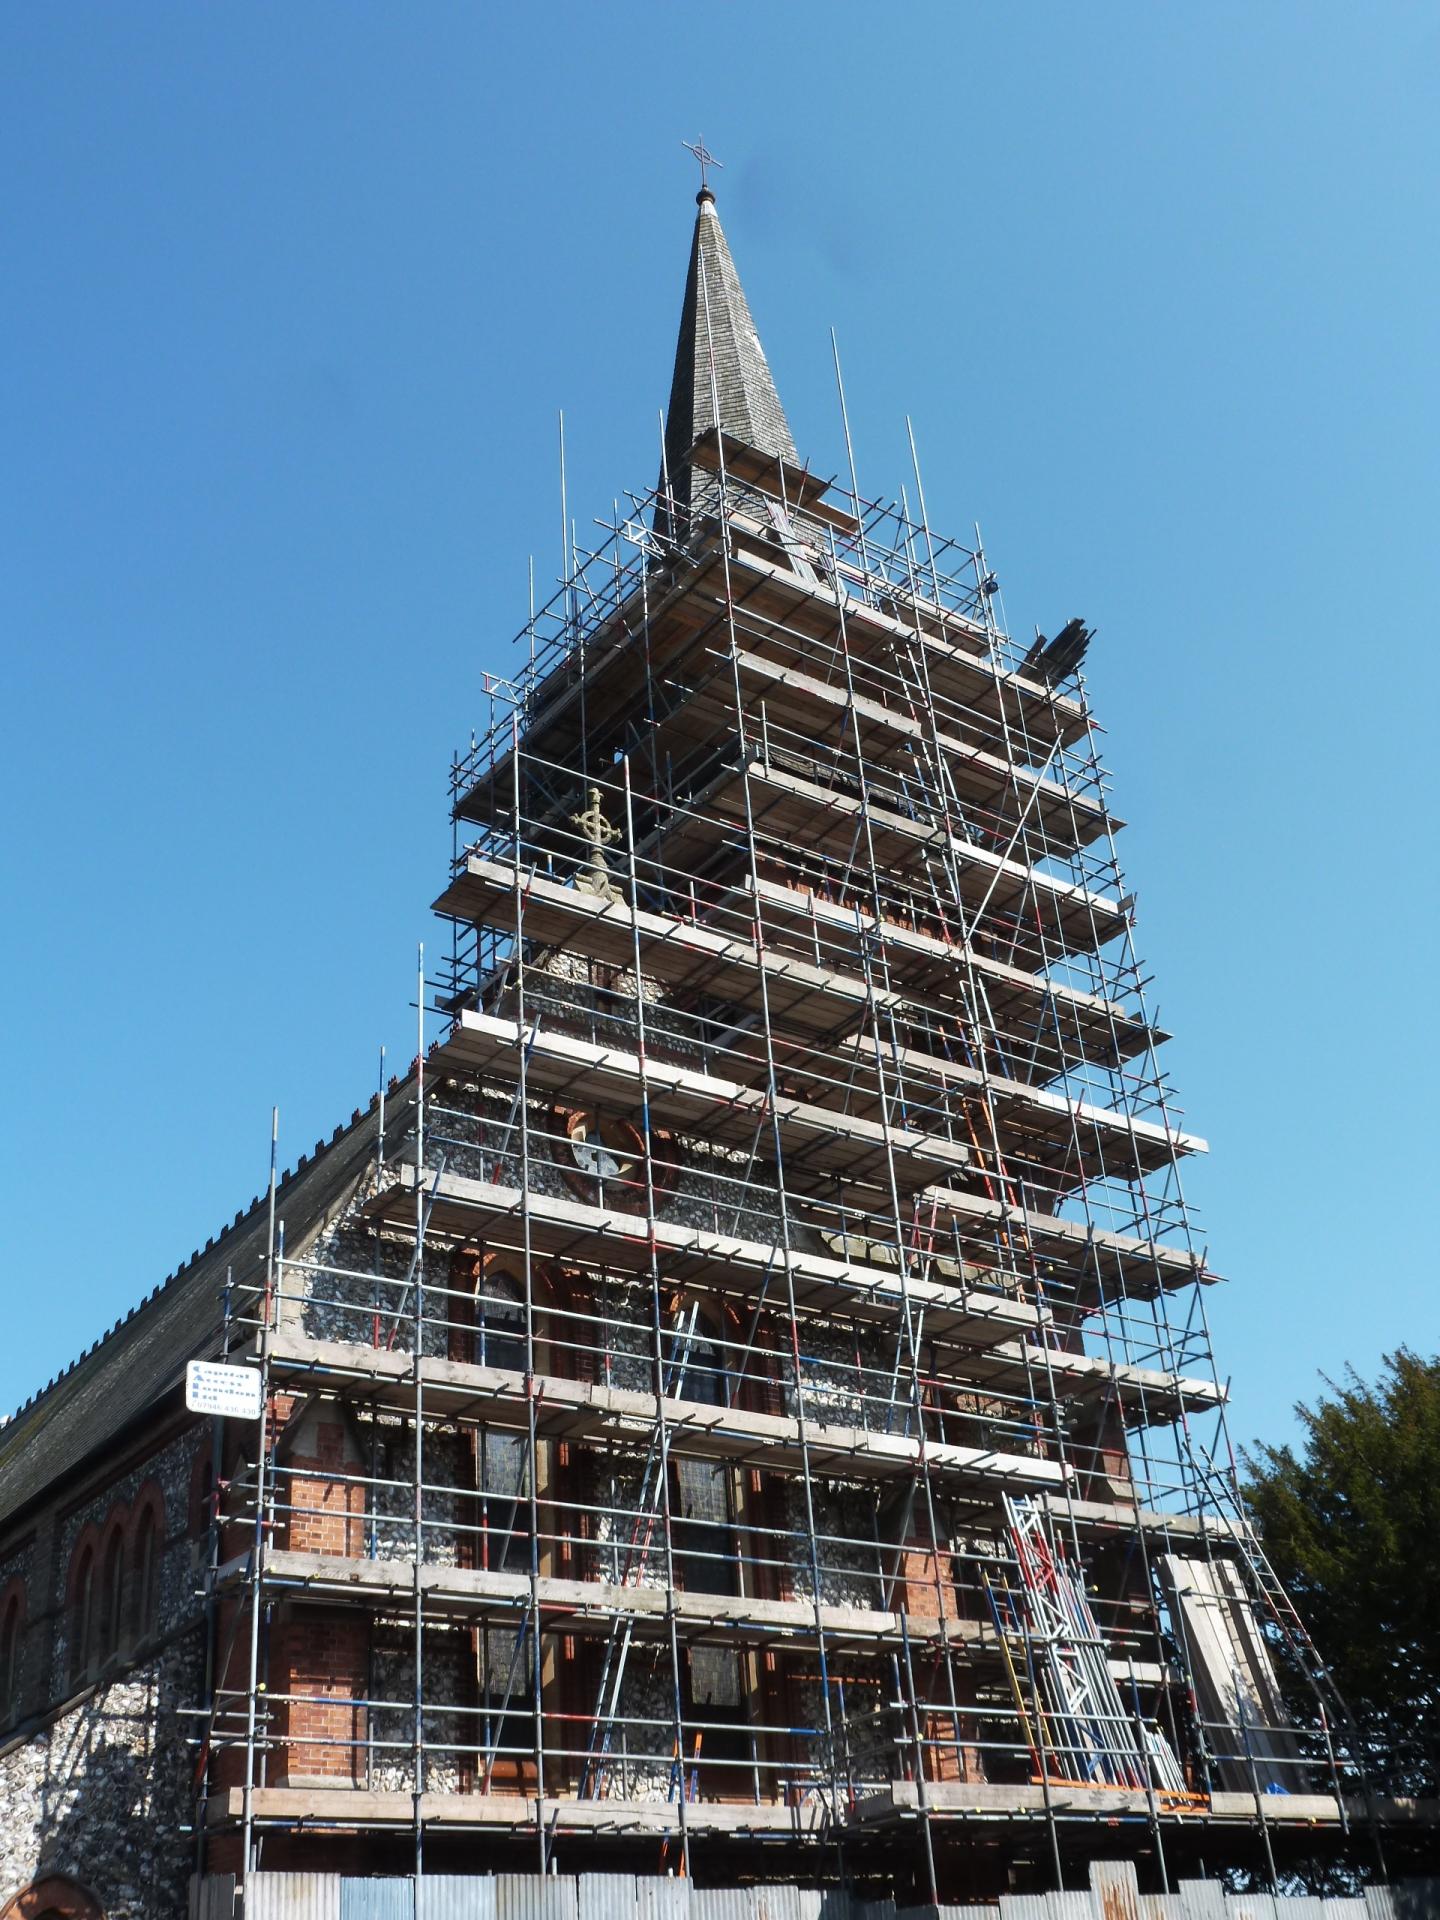 St. Botolph's, Heene, scaffolding, 26.5.16